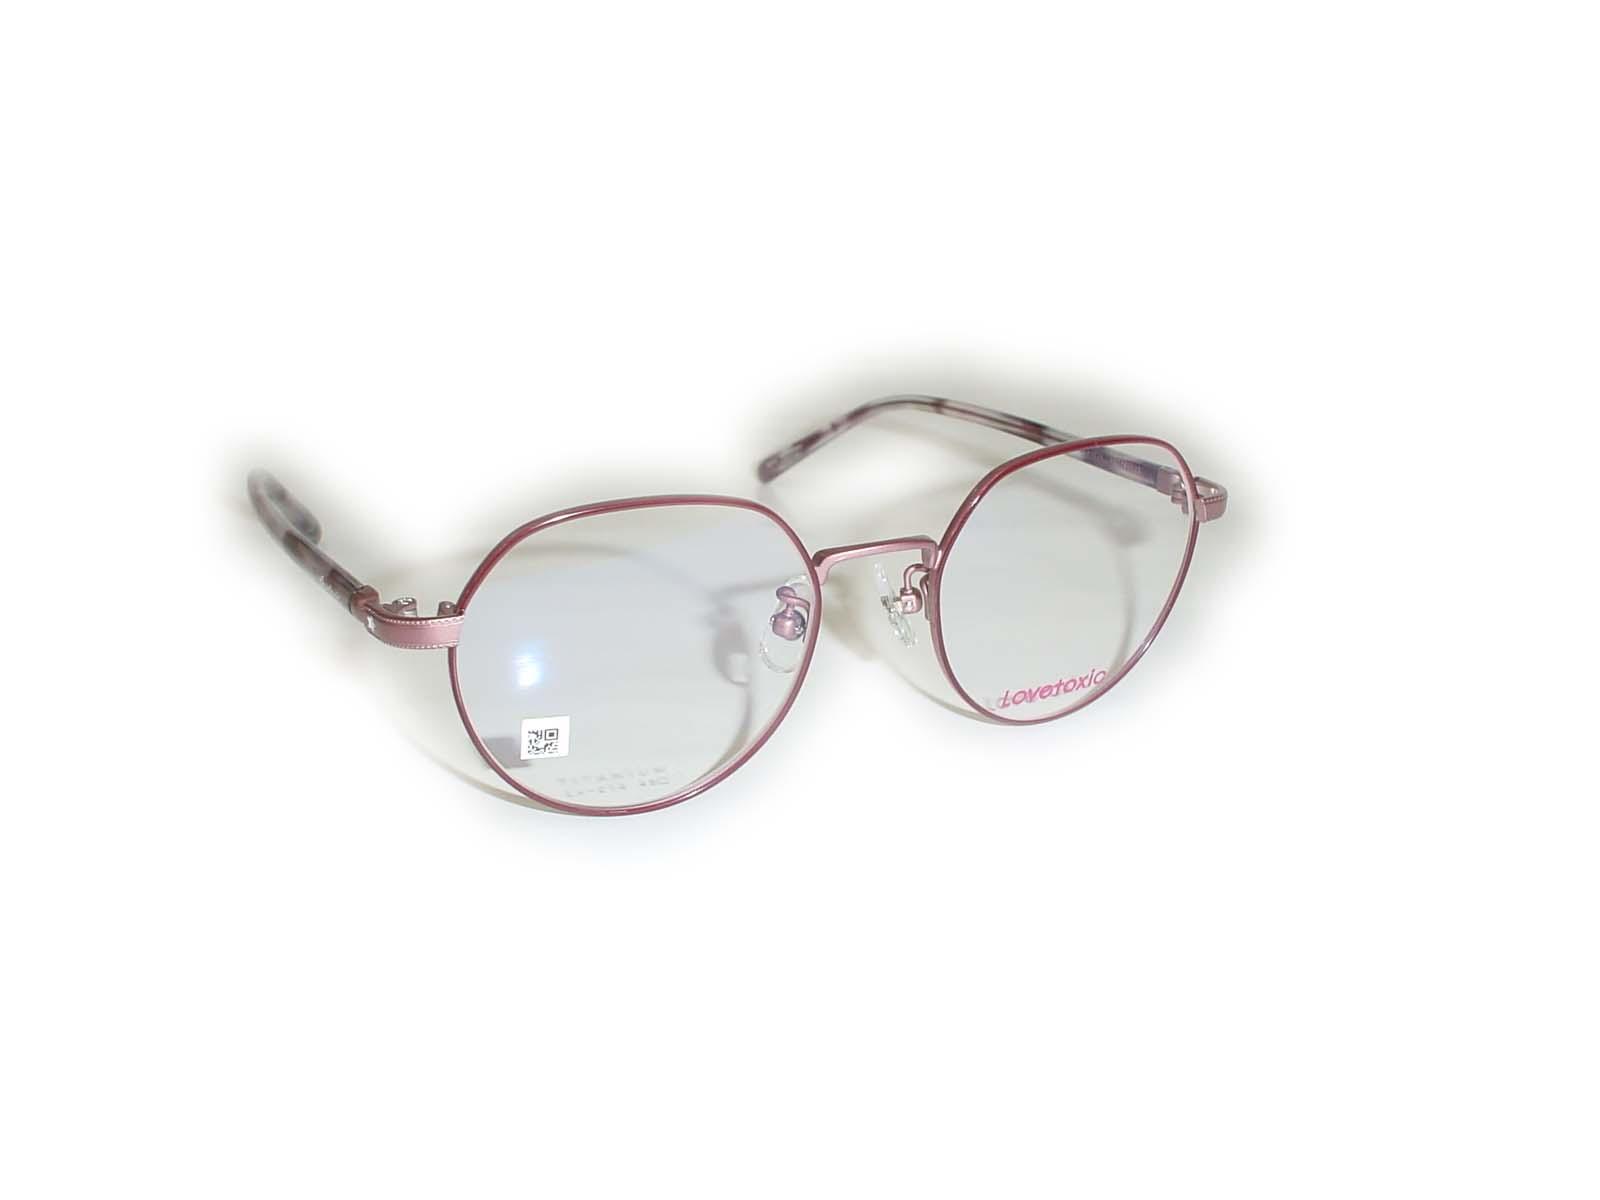 ★Lovetoxic(ラブトキシック)★Lx-21448□18-135COL.2 ピンク超薄型非球面レンズ付